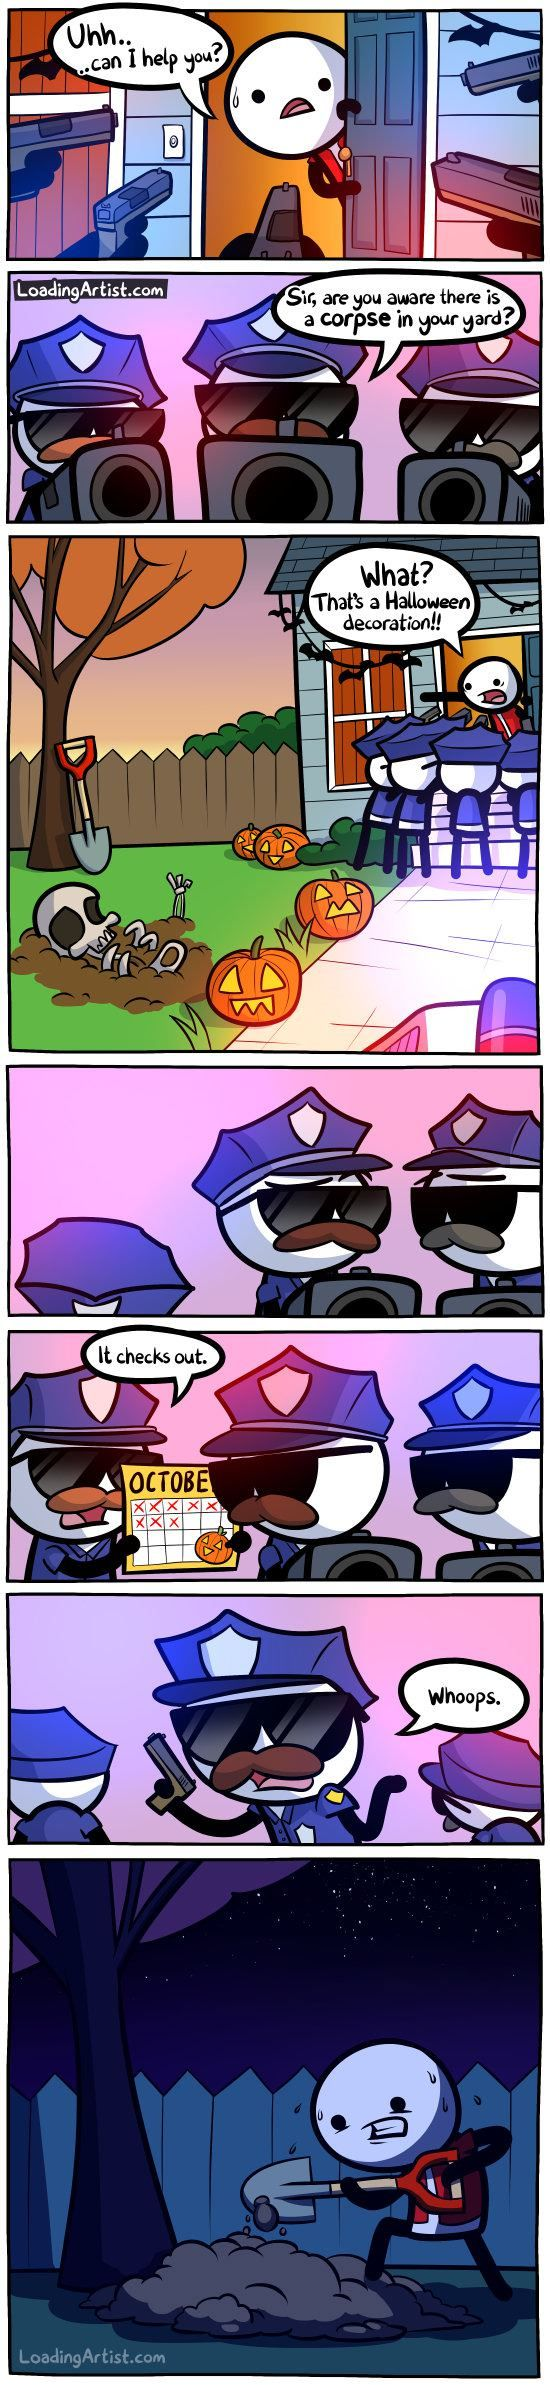 Corpse halloween decoration